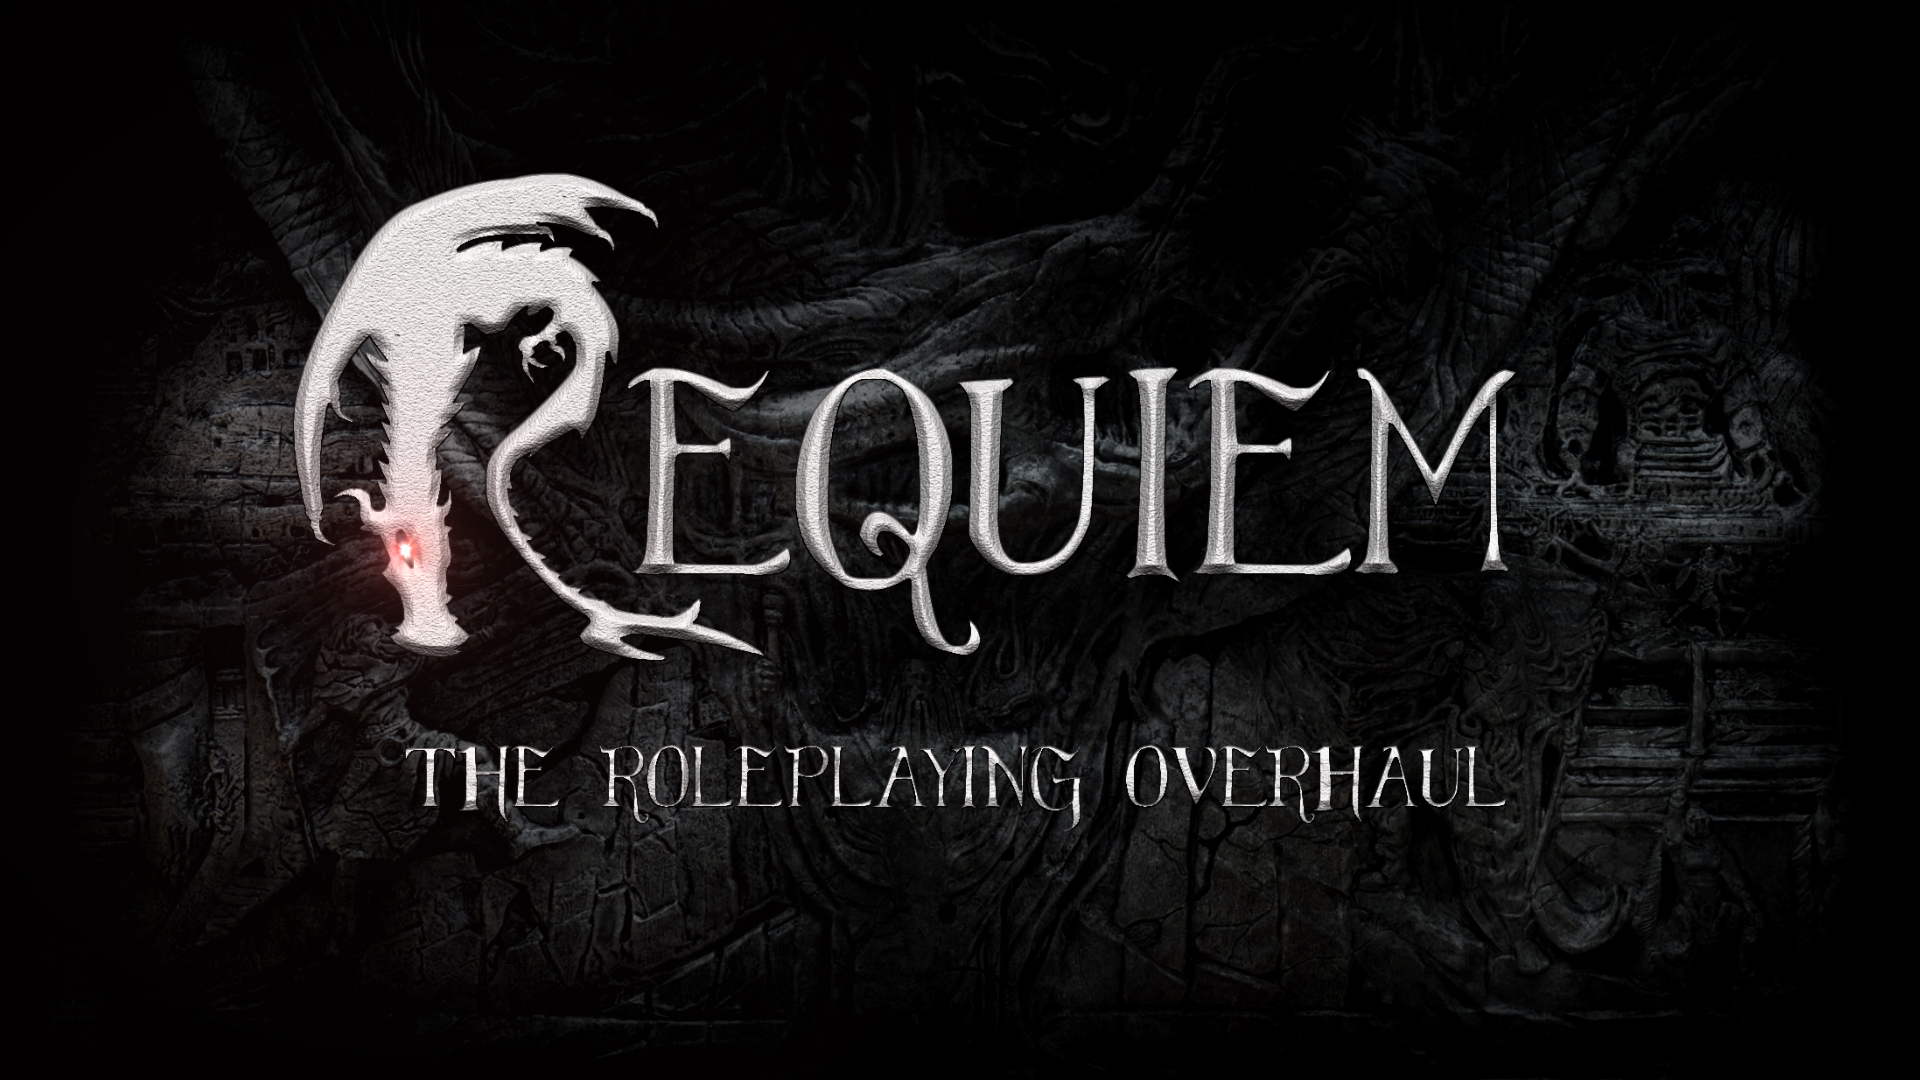 requiem the roleplaying overhaul the elder scrolls mods wiki rh tes mods wikia com skyrim requiem guide pdf skyrim requiem guide fr